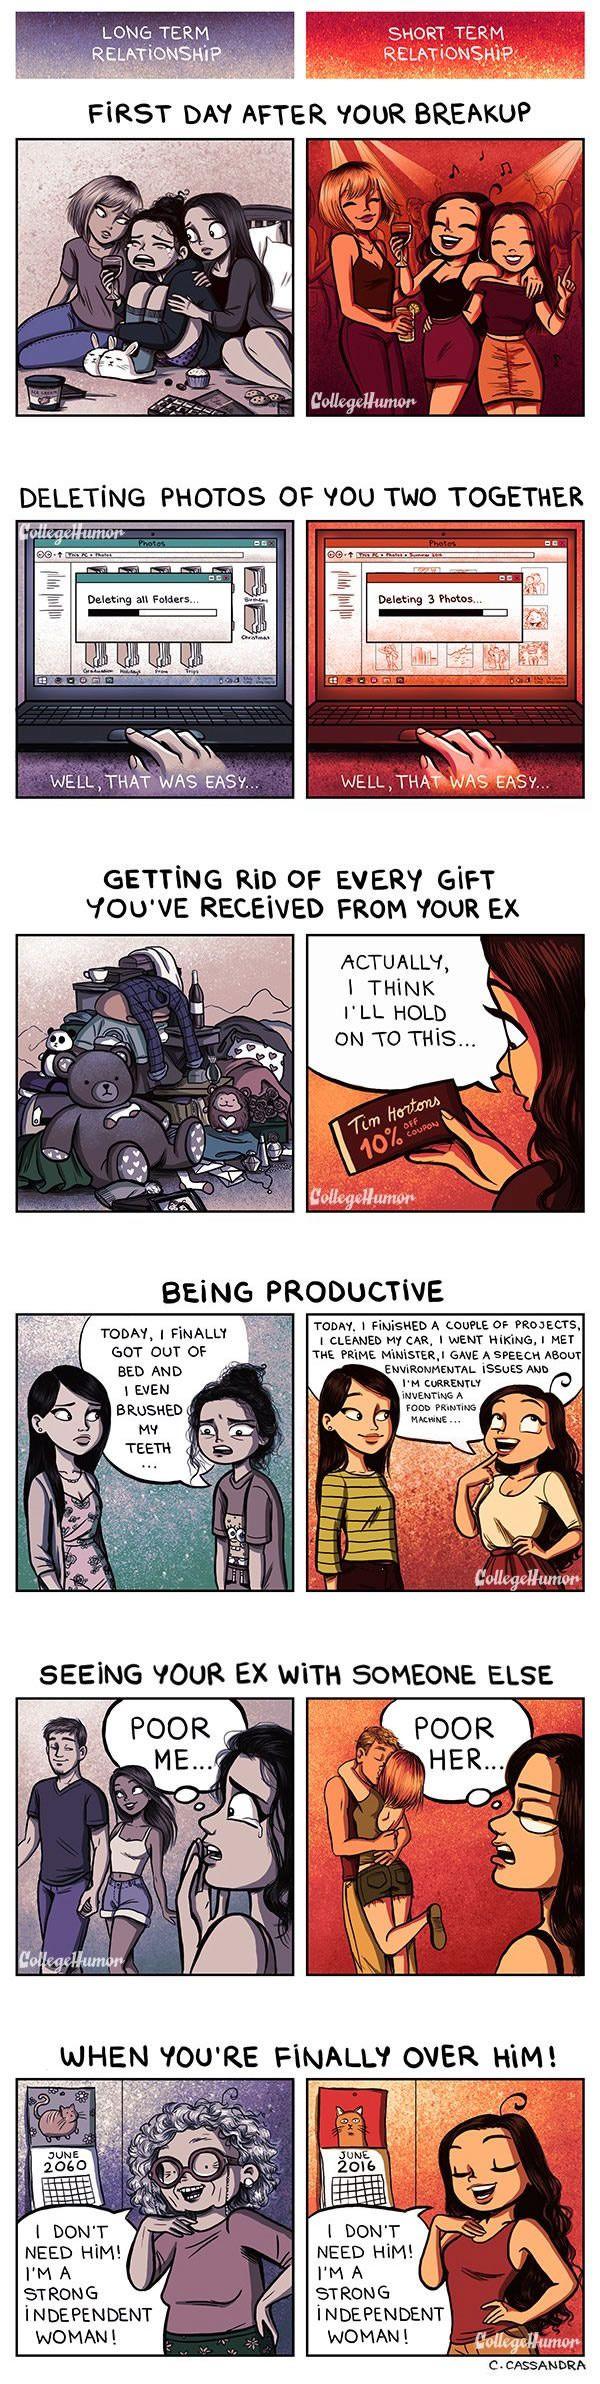 Breakups: Long-Term vs. Short-Term Relationships   By Cassandra Calin [Illustration - Digital - Comic - Love - Funny]